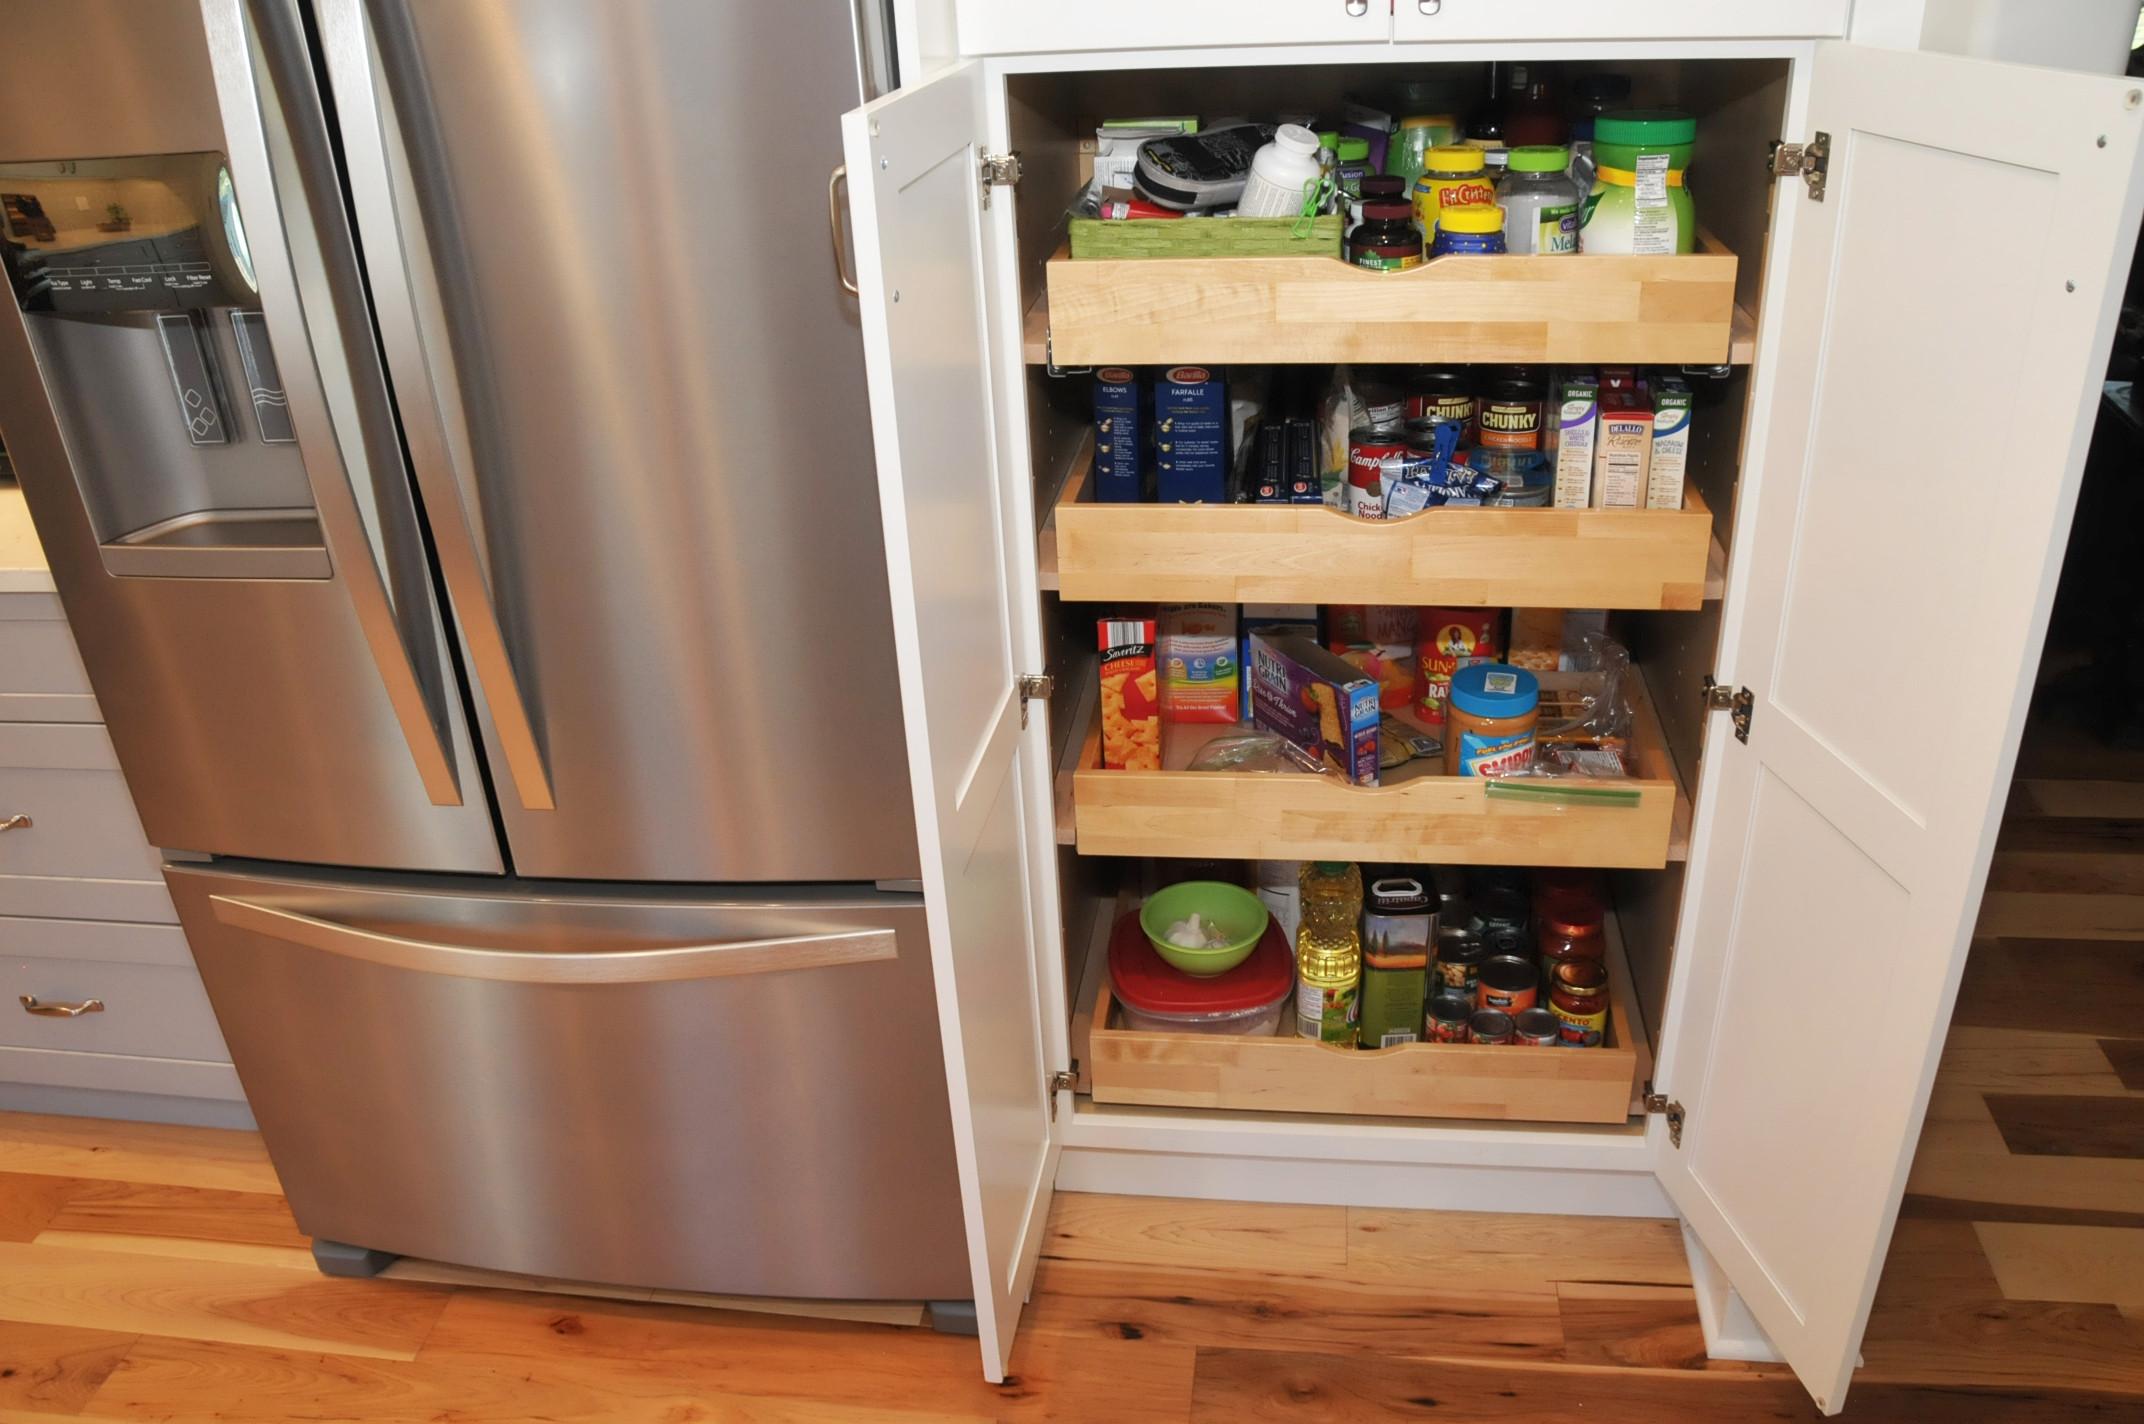 Cape May - Kitchen rejuvenation